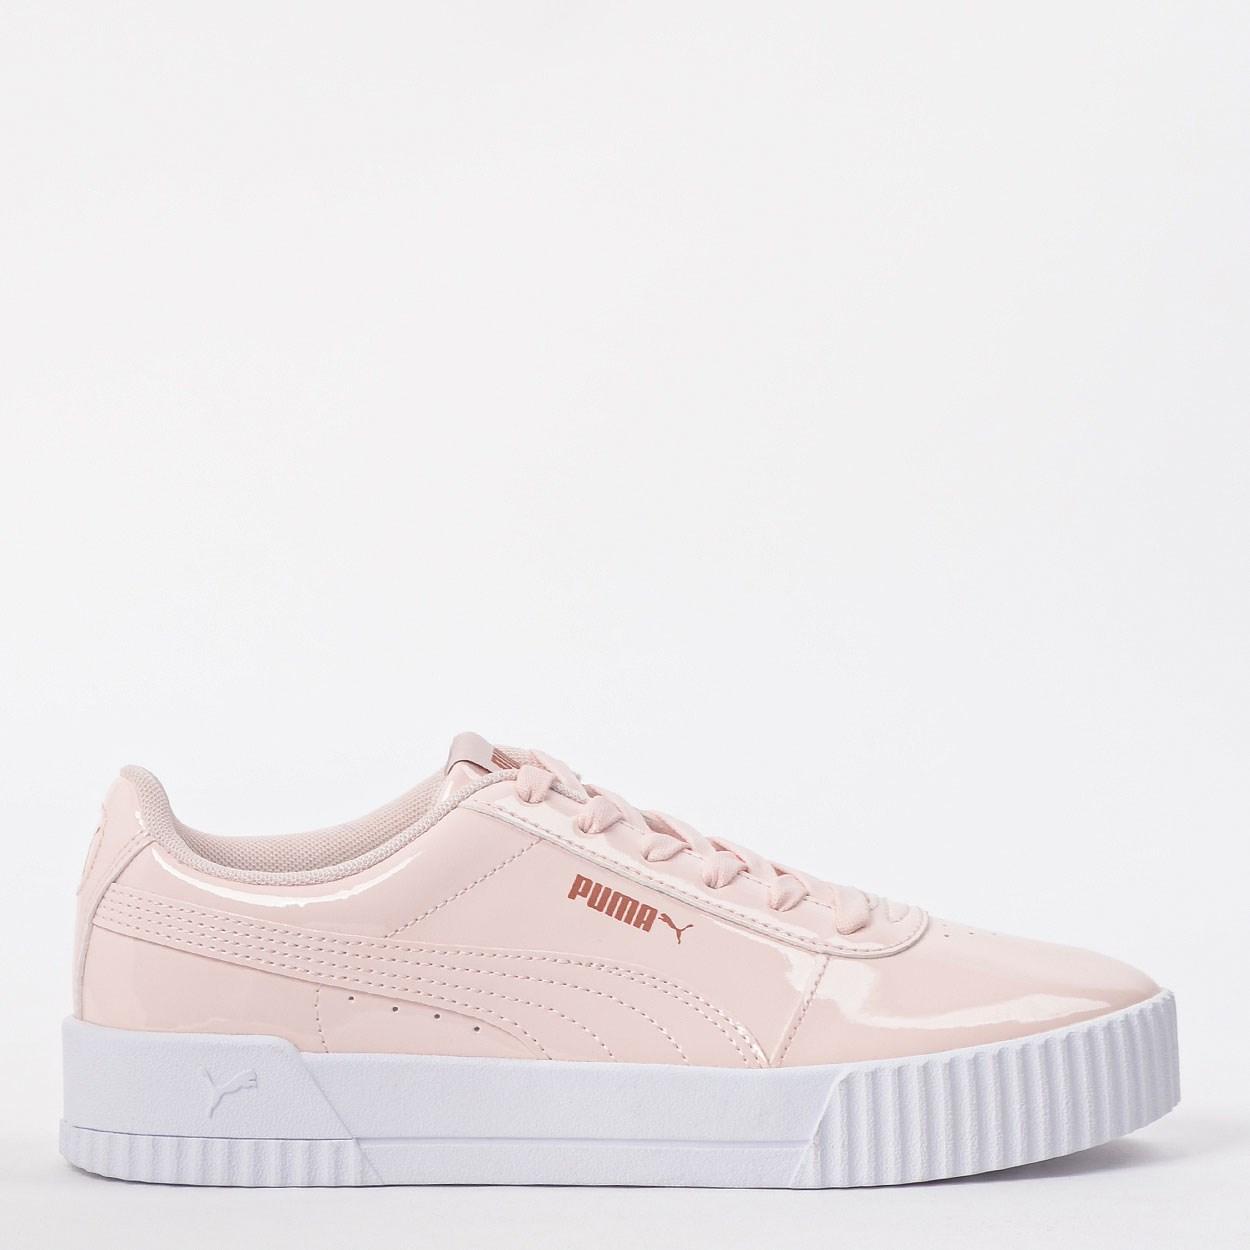 tenis mizuno feminino branco e rosa karina